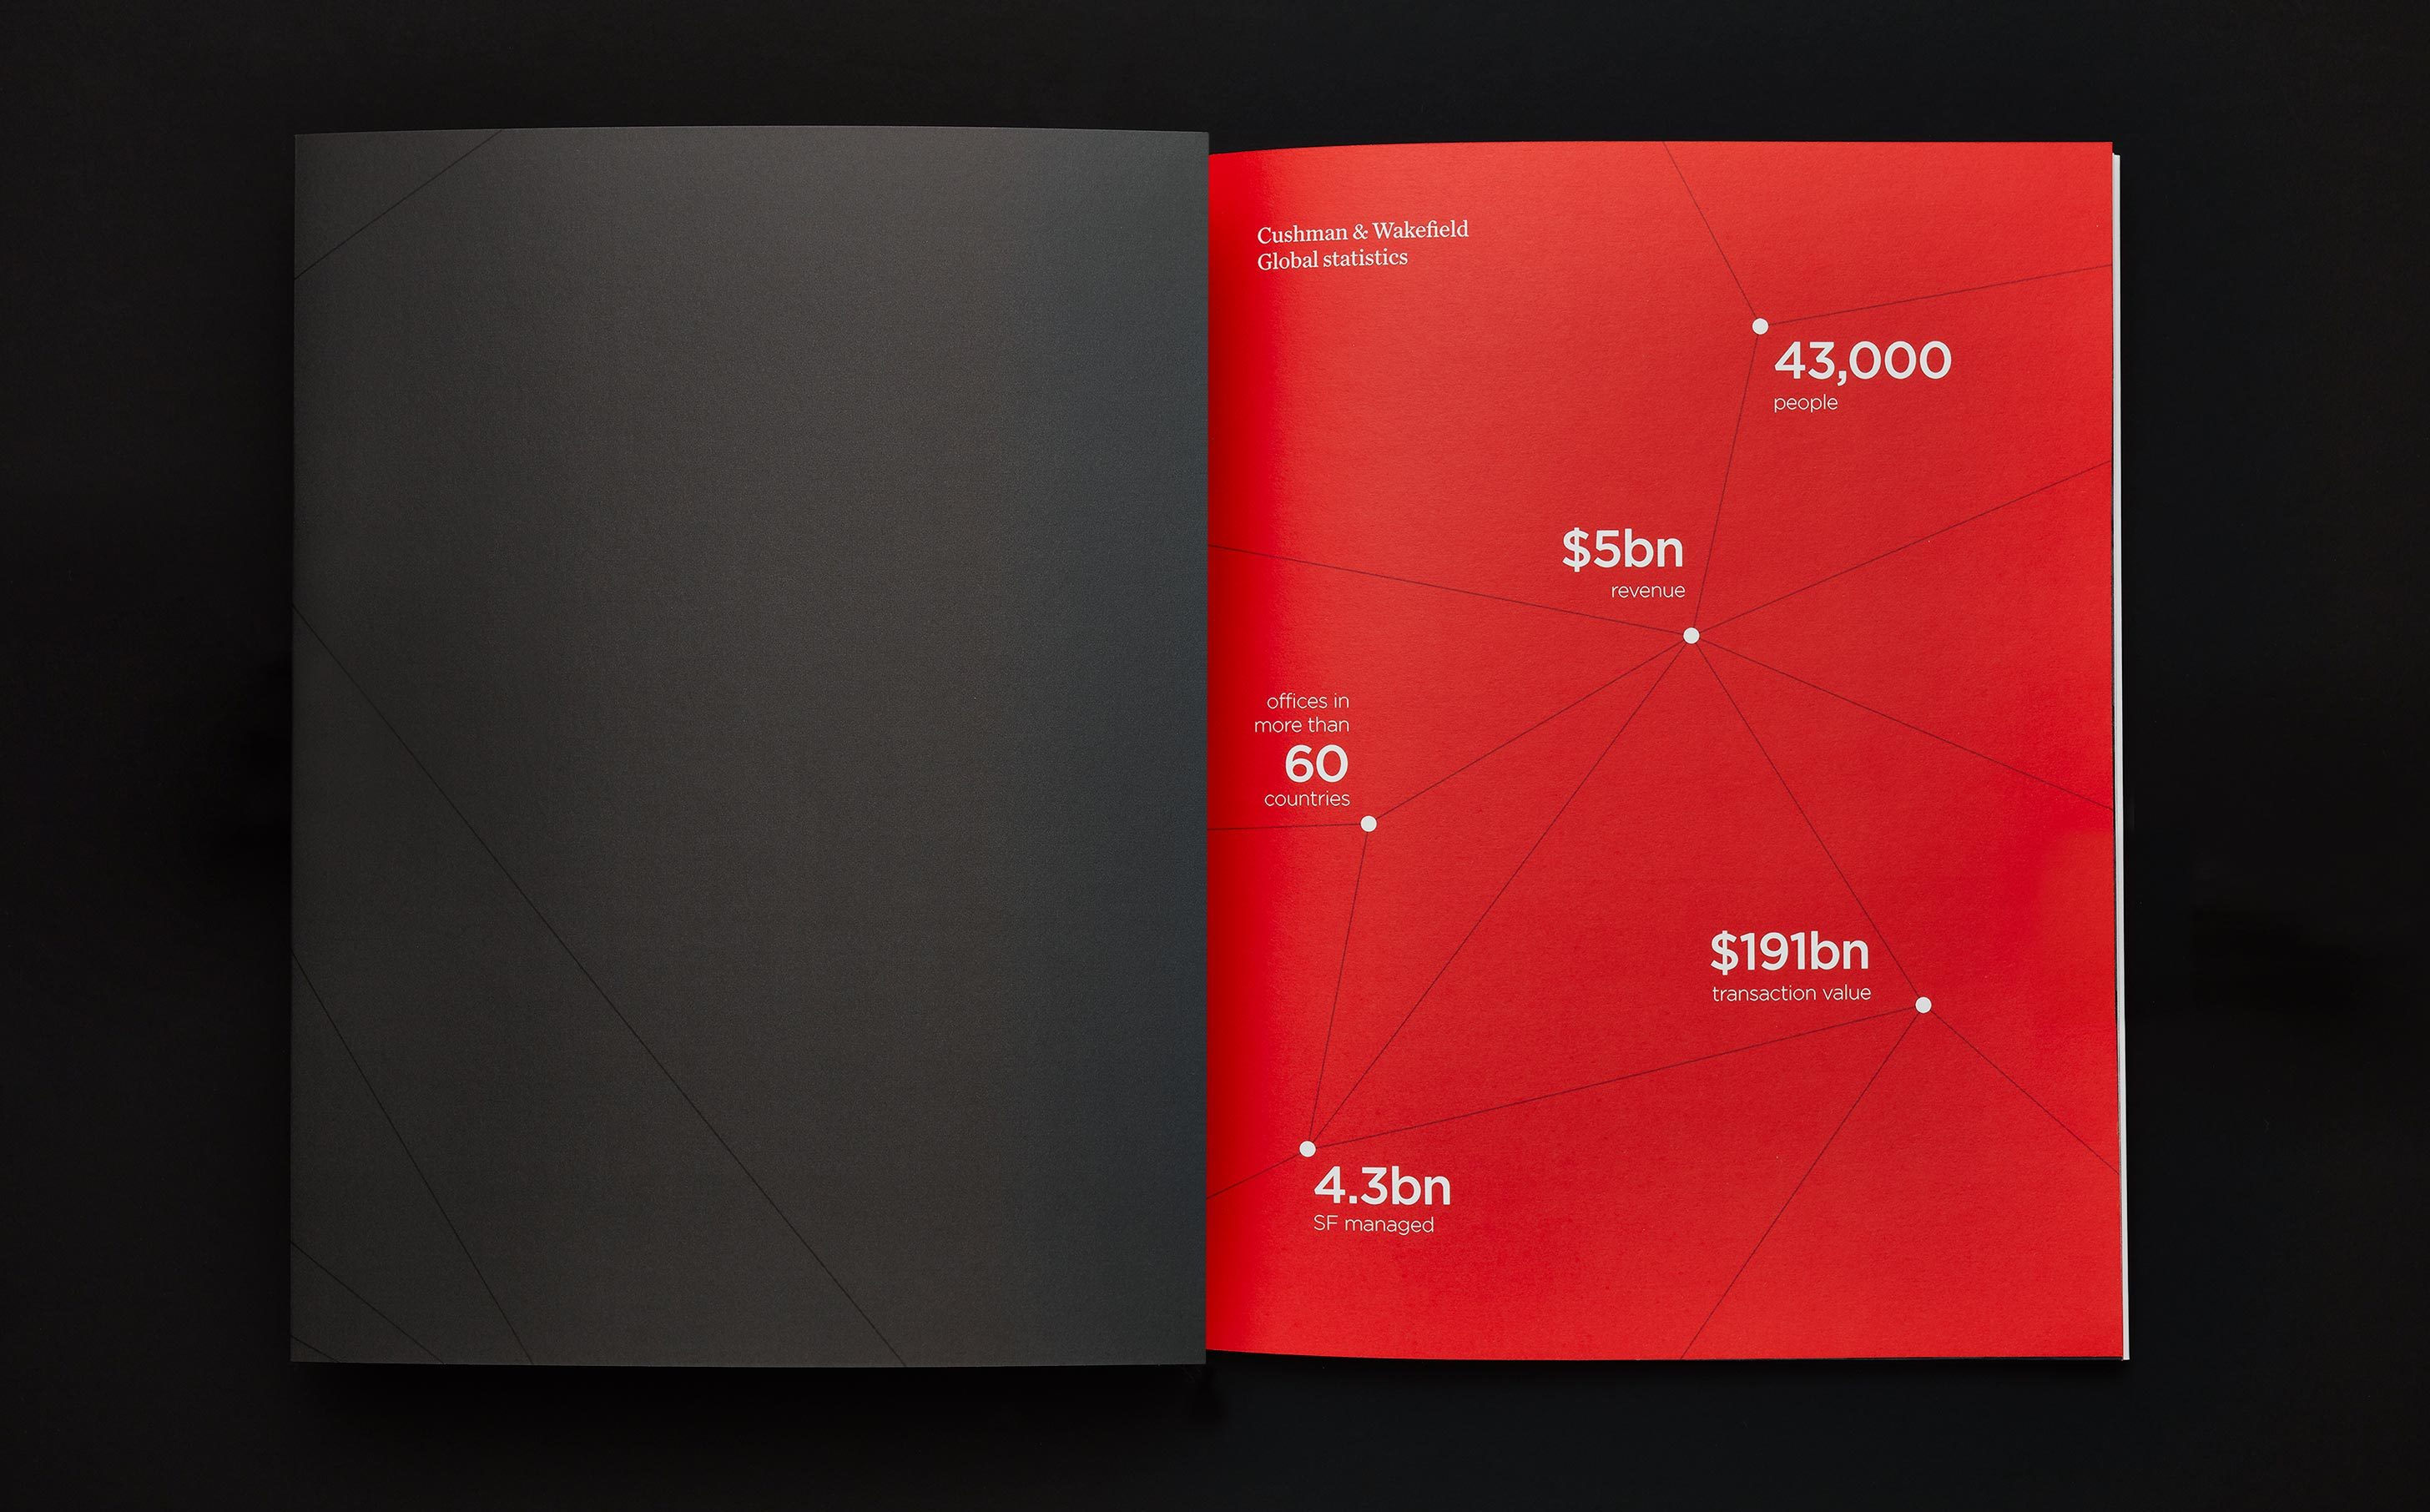 Cushman-wakefiled-EMEA-brochure-1